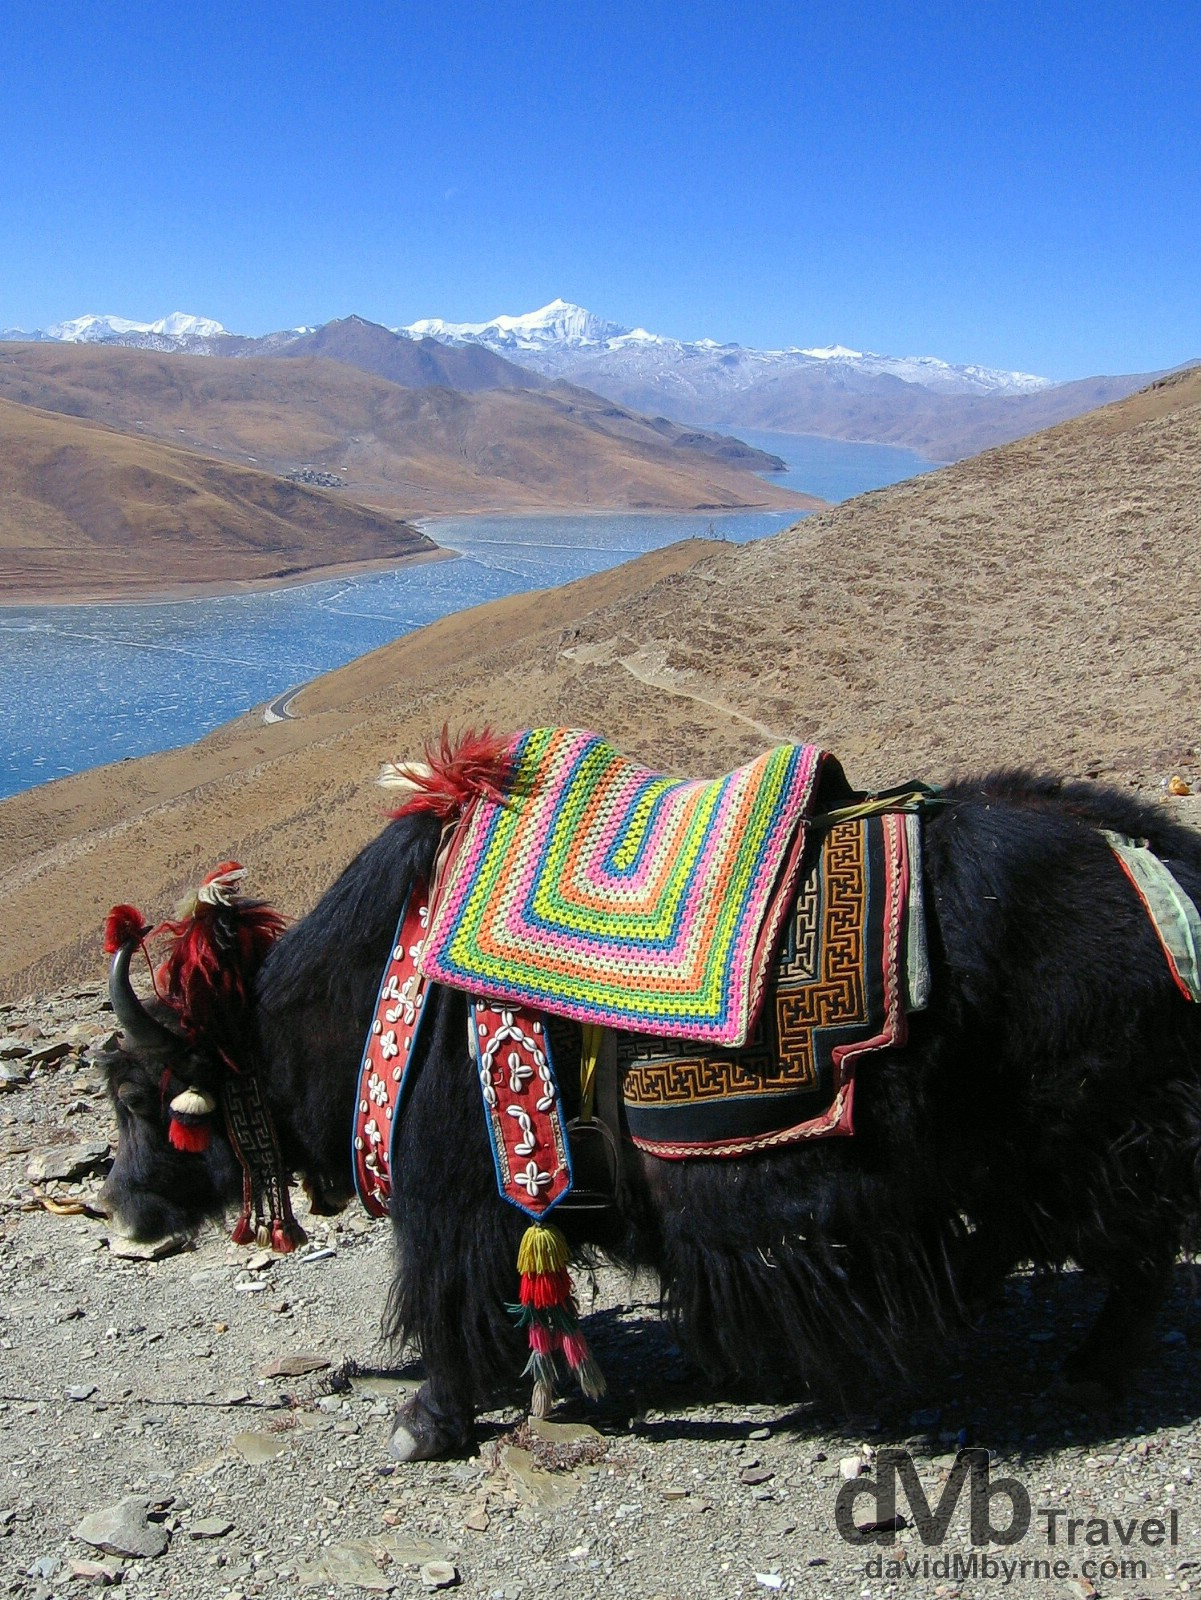 A yak on the Kamba-la pass (15,800ft, 4,794m) of the Friendship Highway overlooking a frozen Yamdrok-tso lake, Tibet. February 29th 2008.